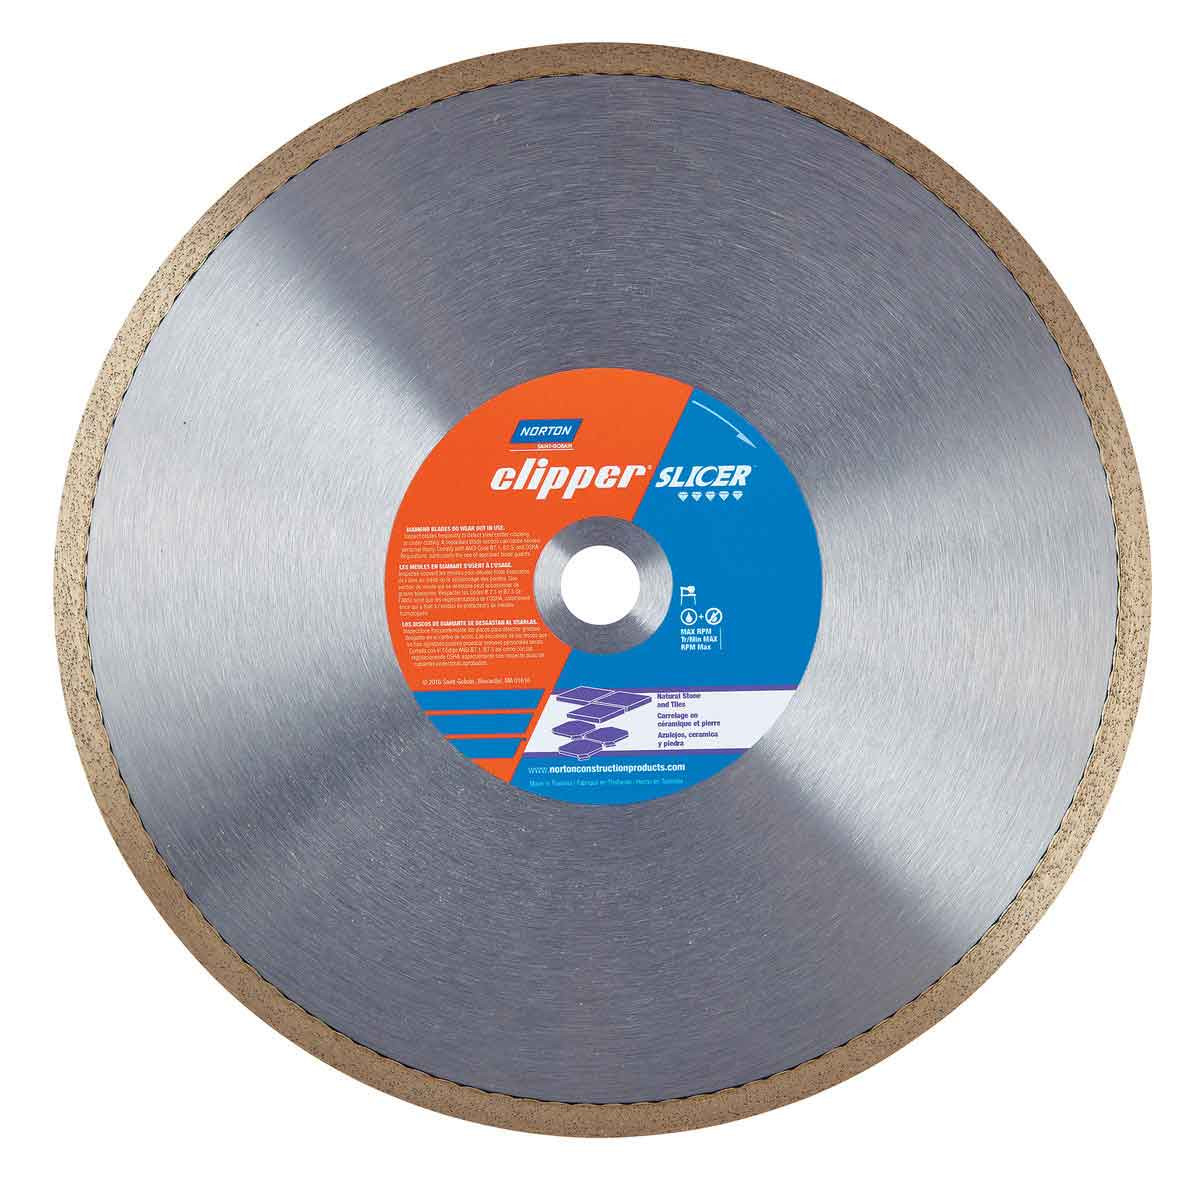 Norton Clipper Slicer wet tile saw Diamond Blade